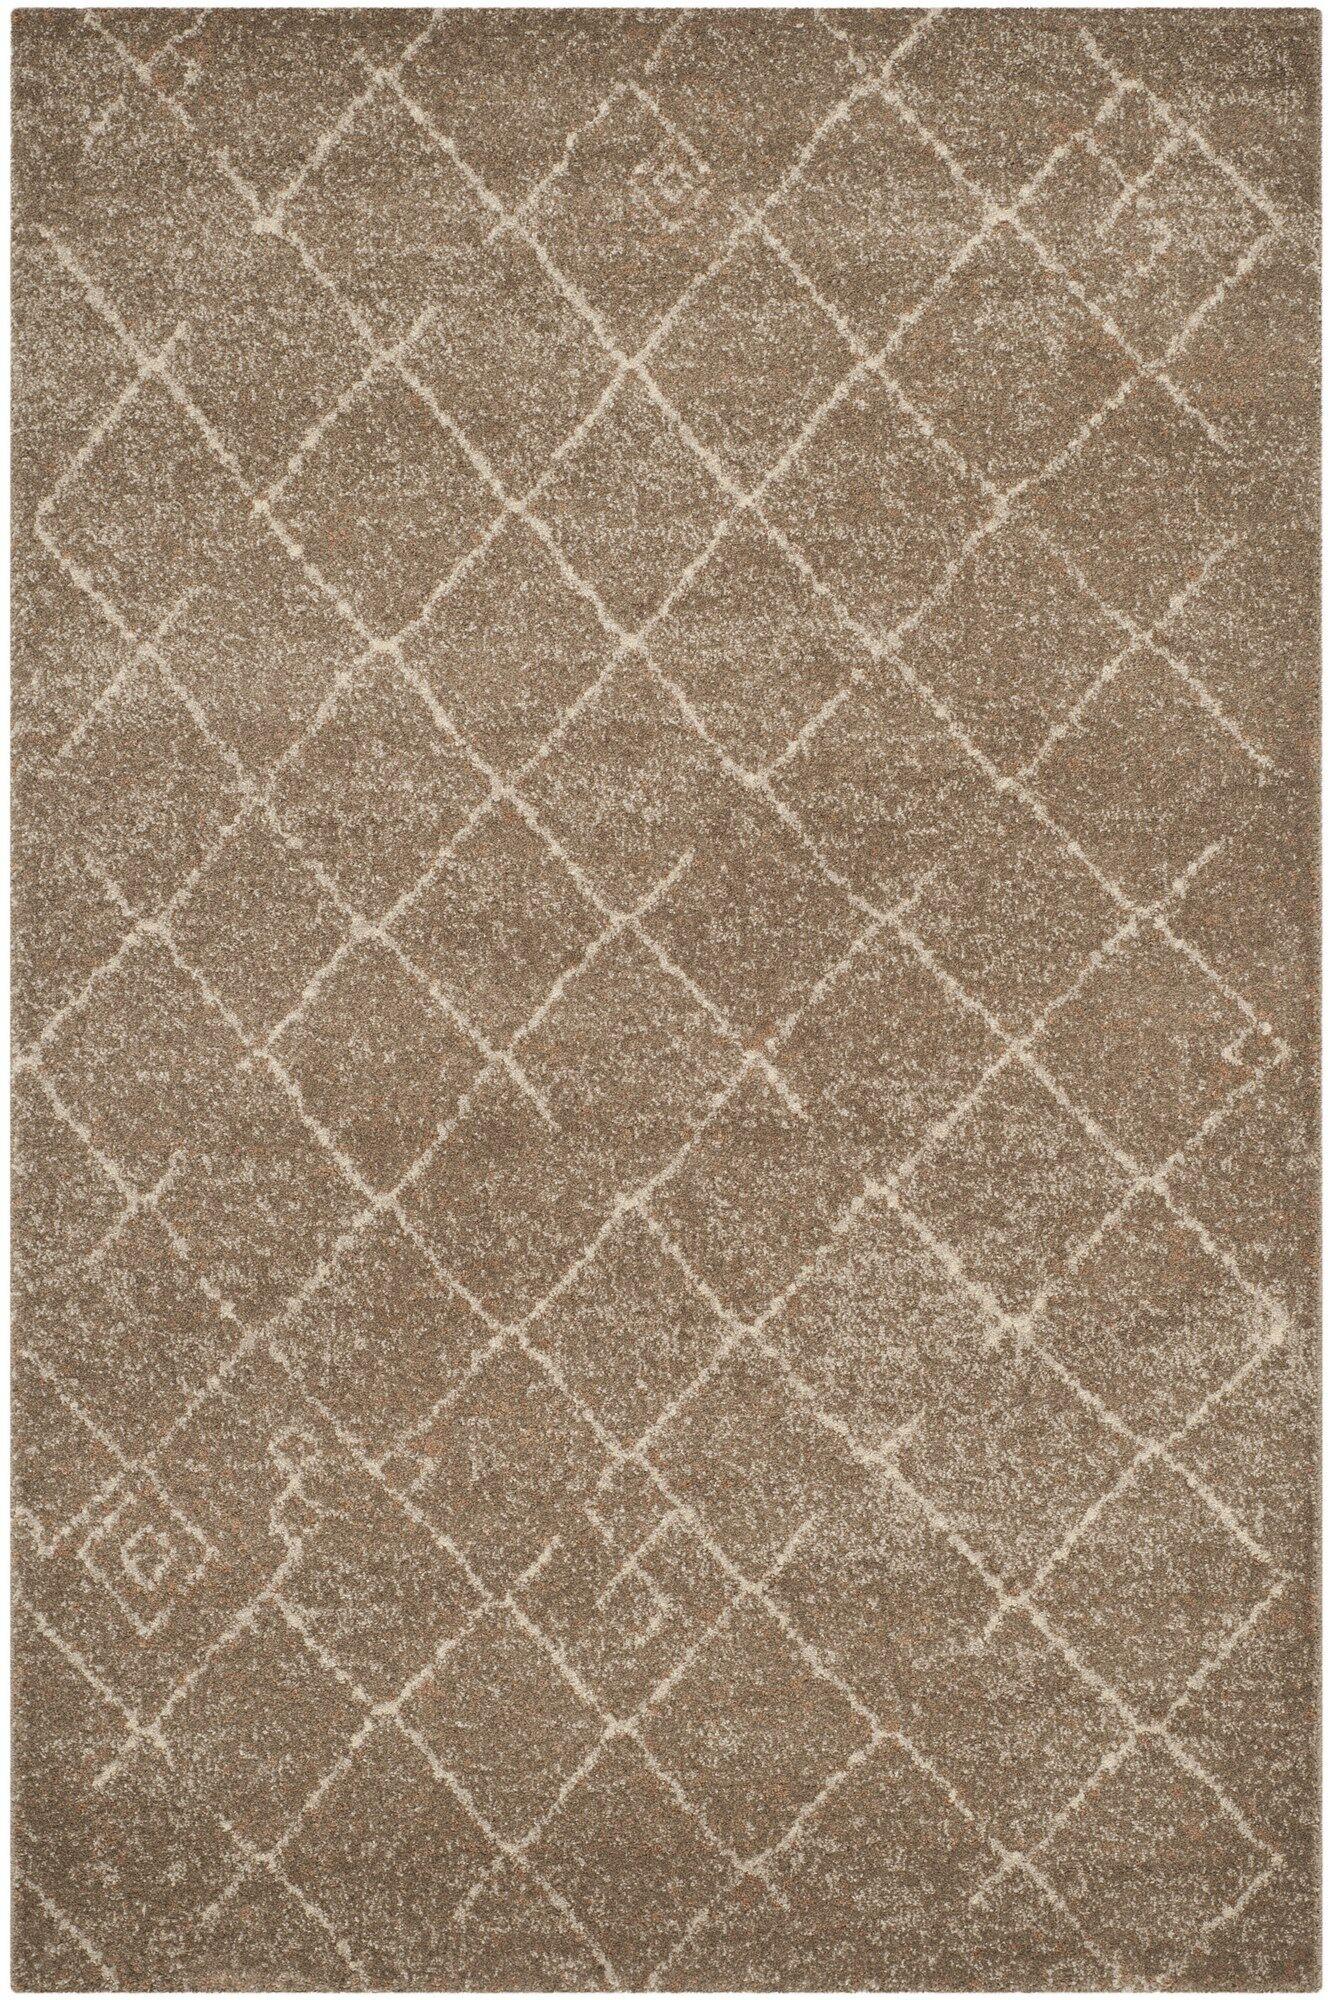 Bennett Brown Area Rug Rug Size: Rectangle 9' x 12'